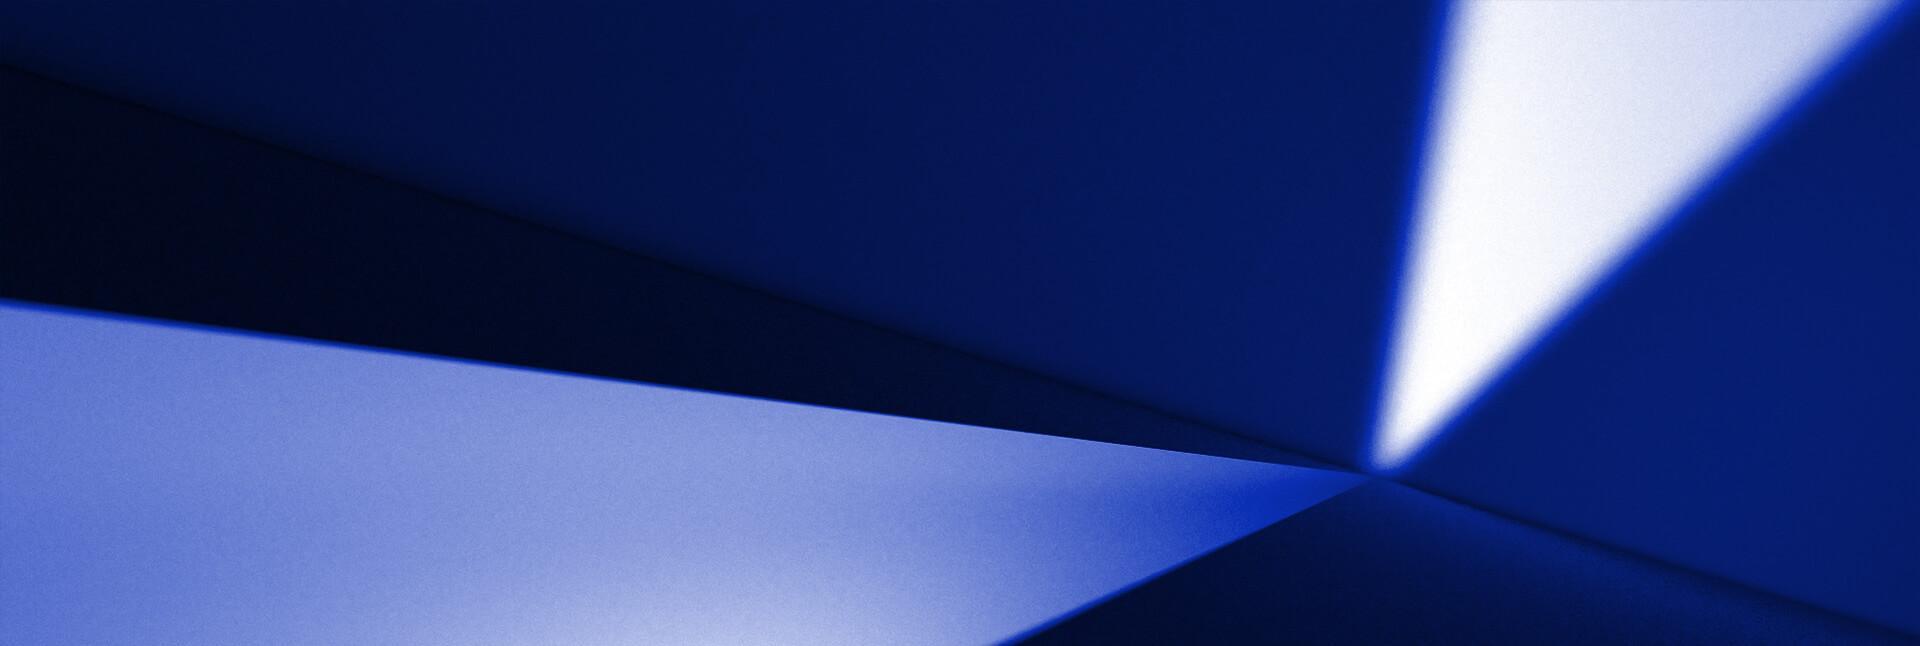 rra-background-blue-10-2021.jpg